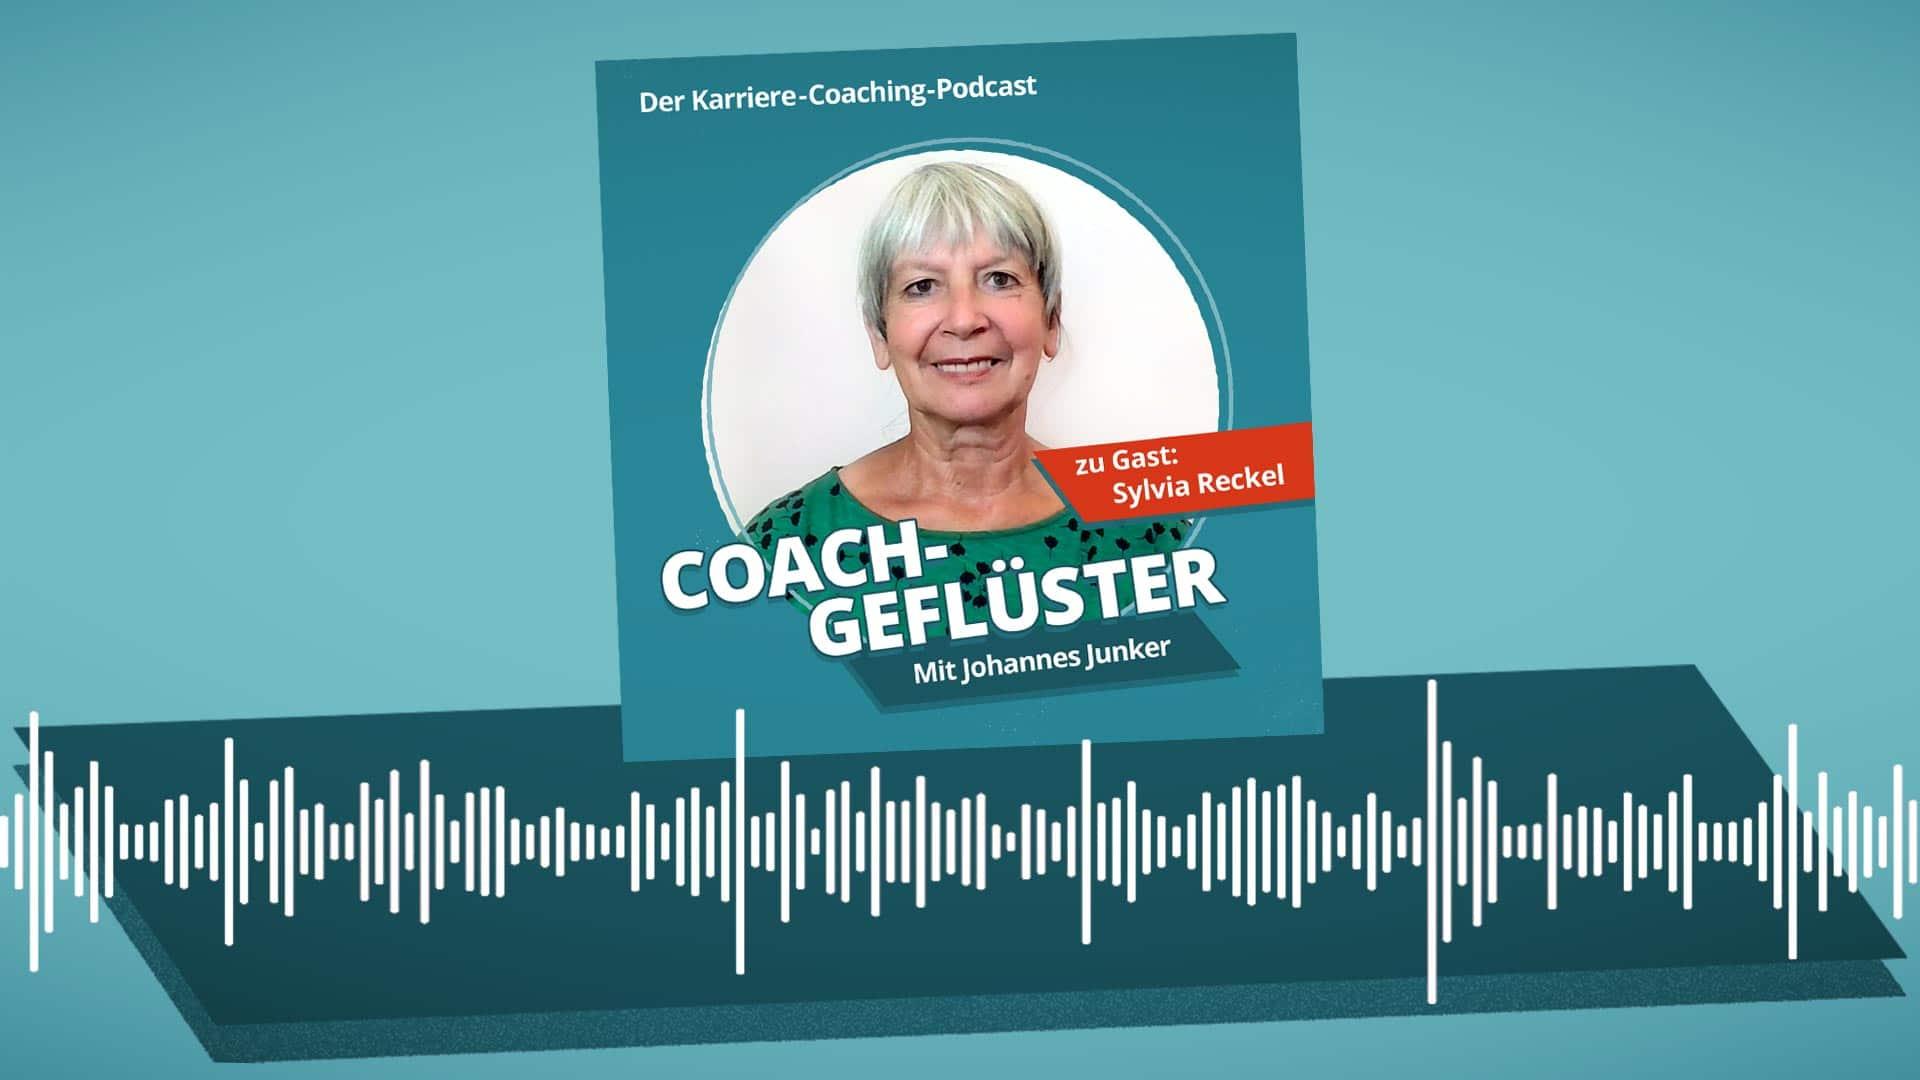 Podcast-Cover COACHGEFLÜSTER – Folge 5 mit Sylvia Reckel